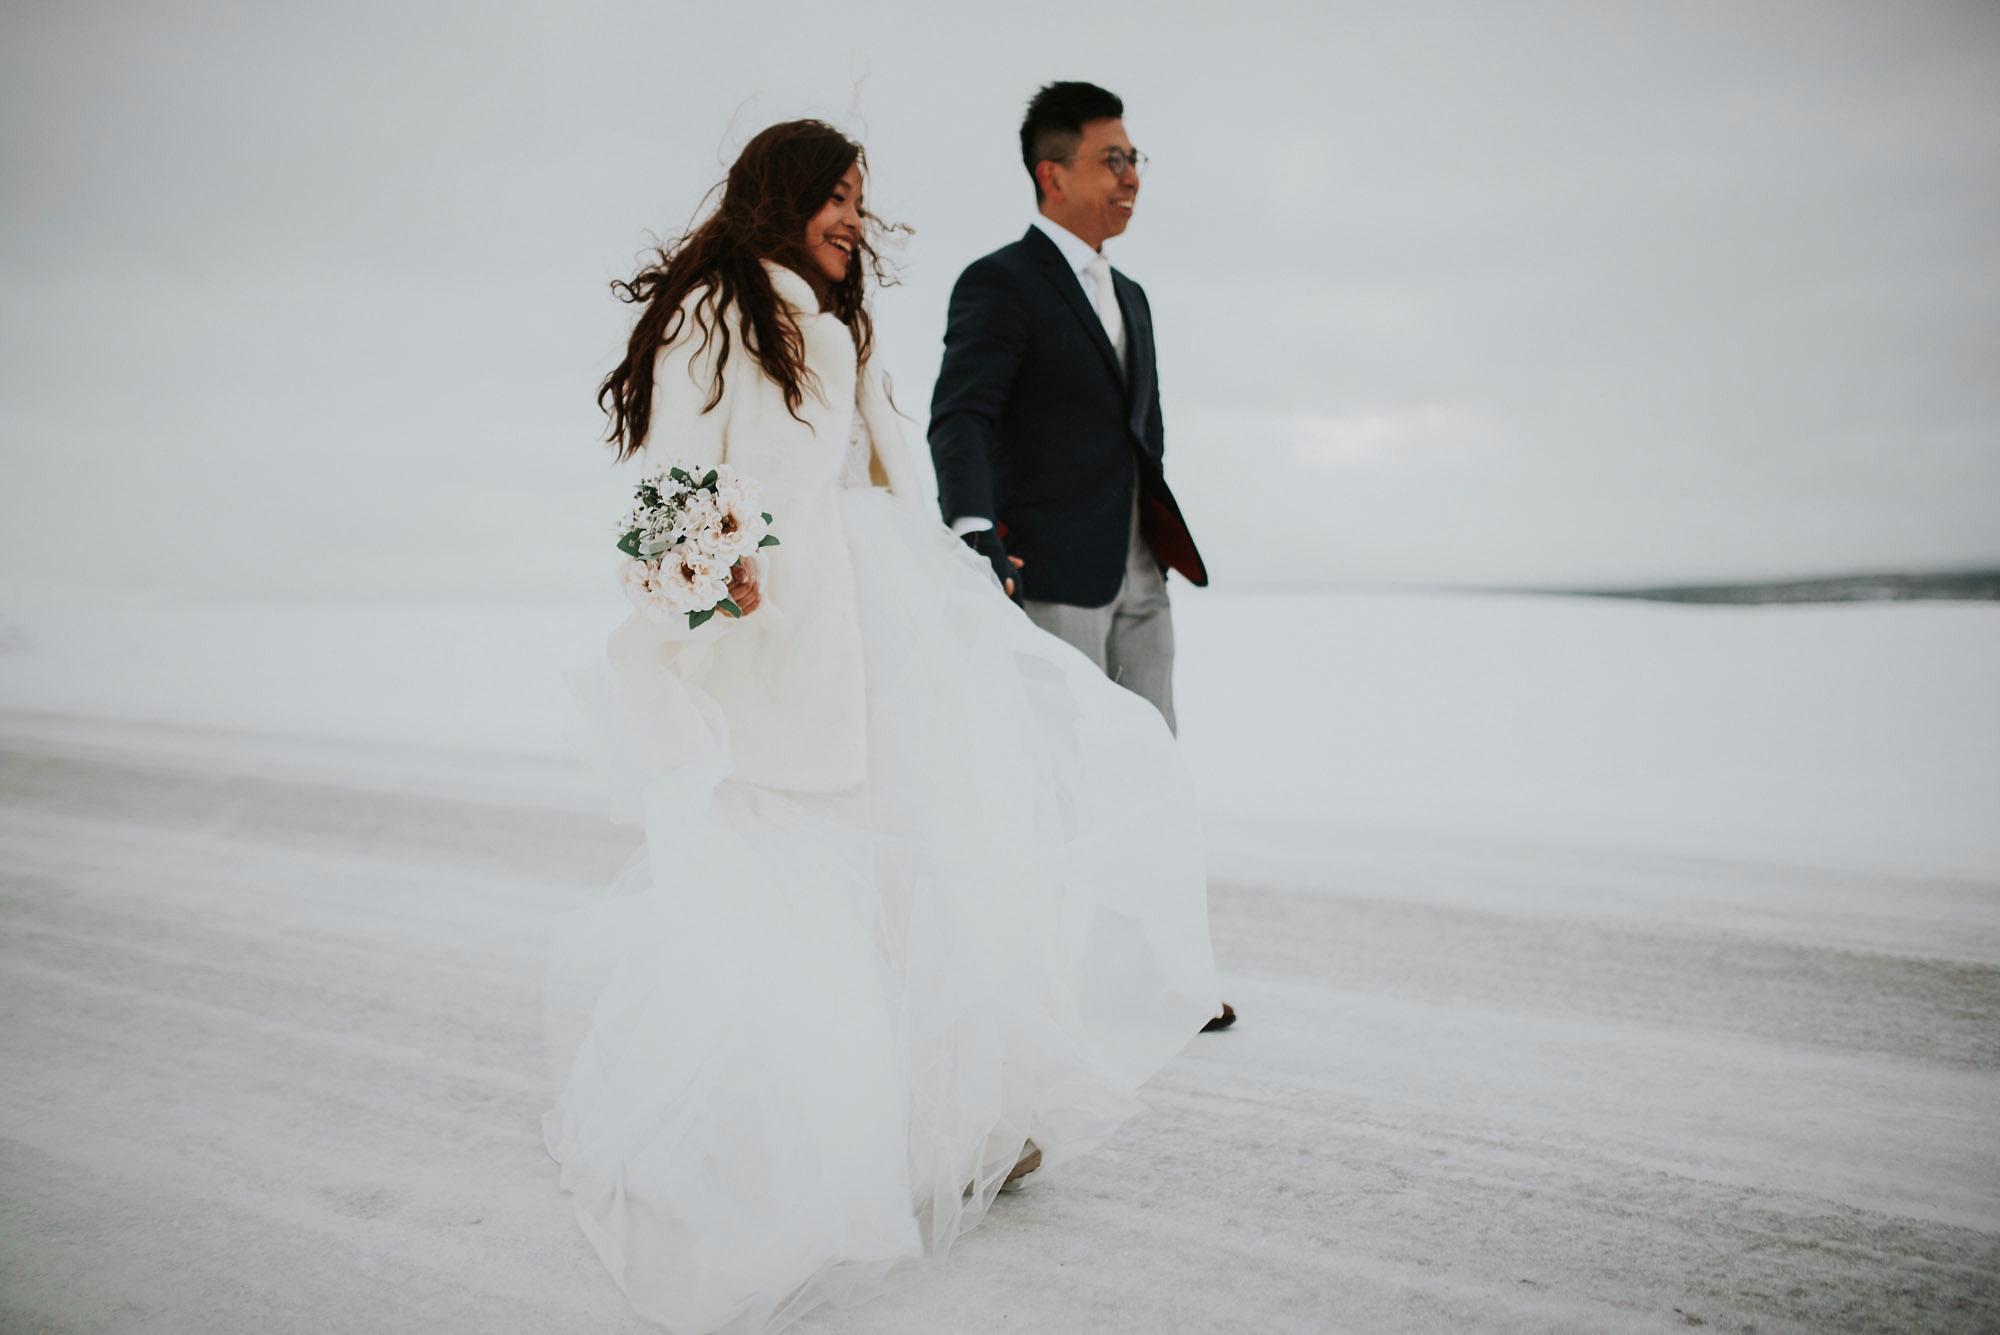 levi-ice-chapel-weddings-lapland-finland-photographer-jere-satamo-022-blog.jpg